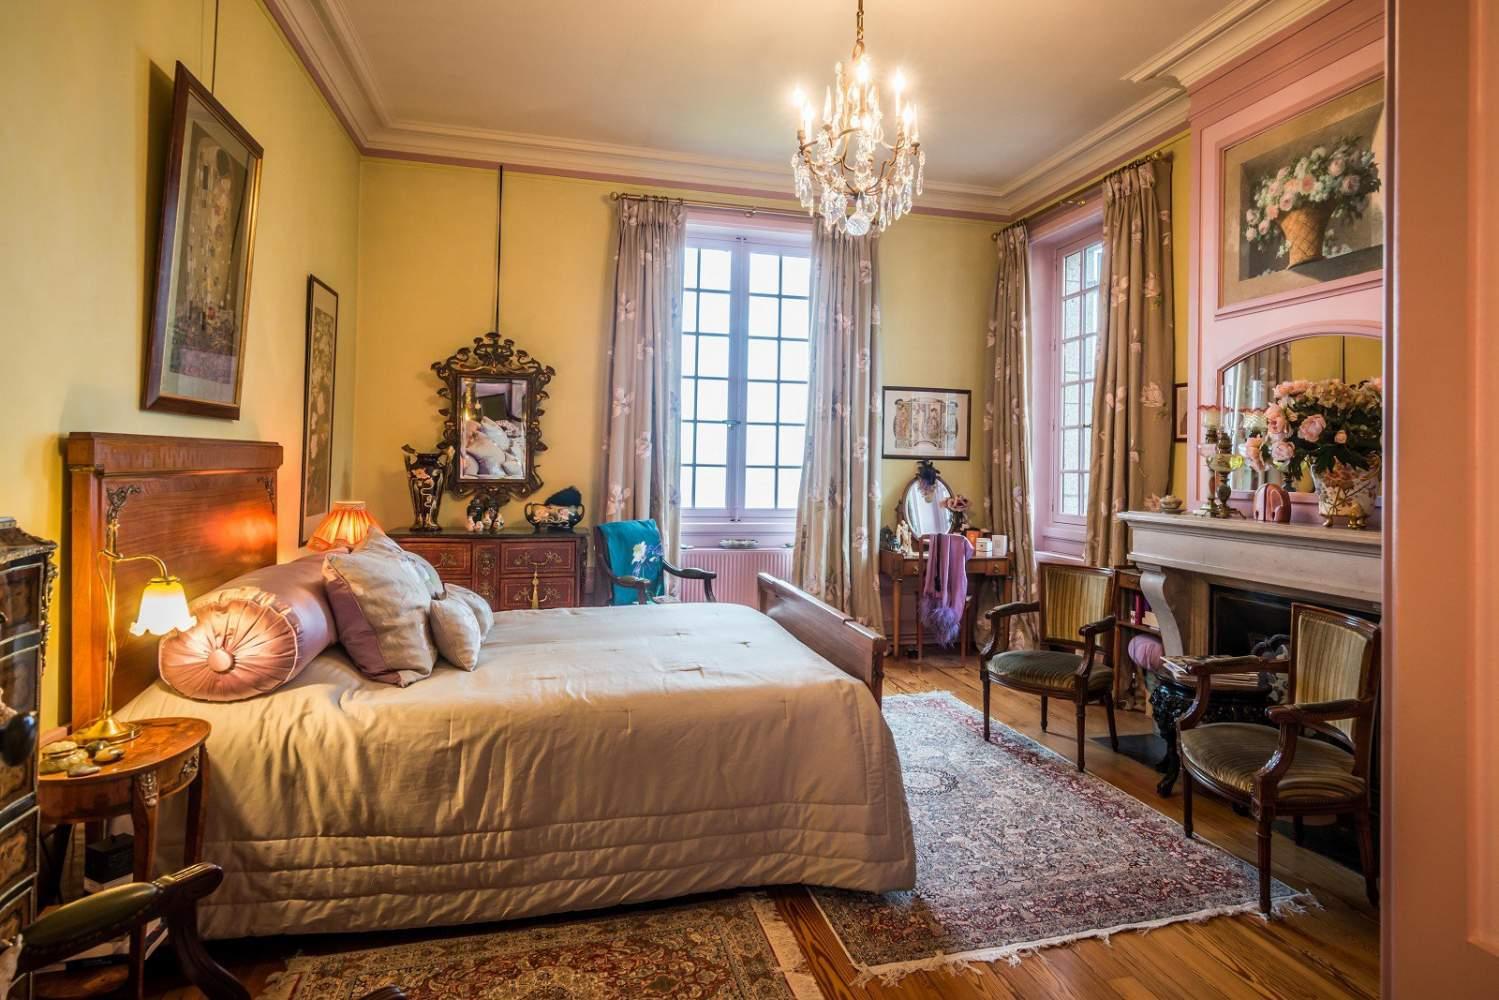 Thonon-les-Bains  - Casa 16 Cuartos 10 Habitaciones - picture 13